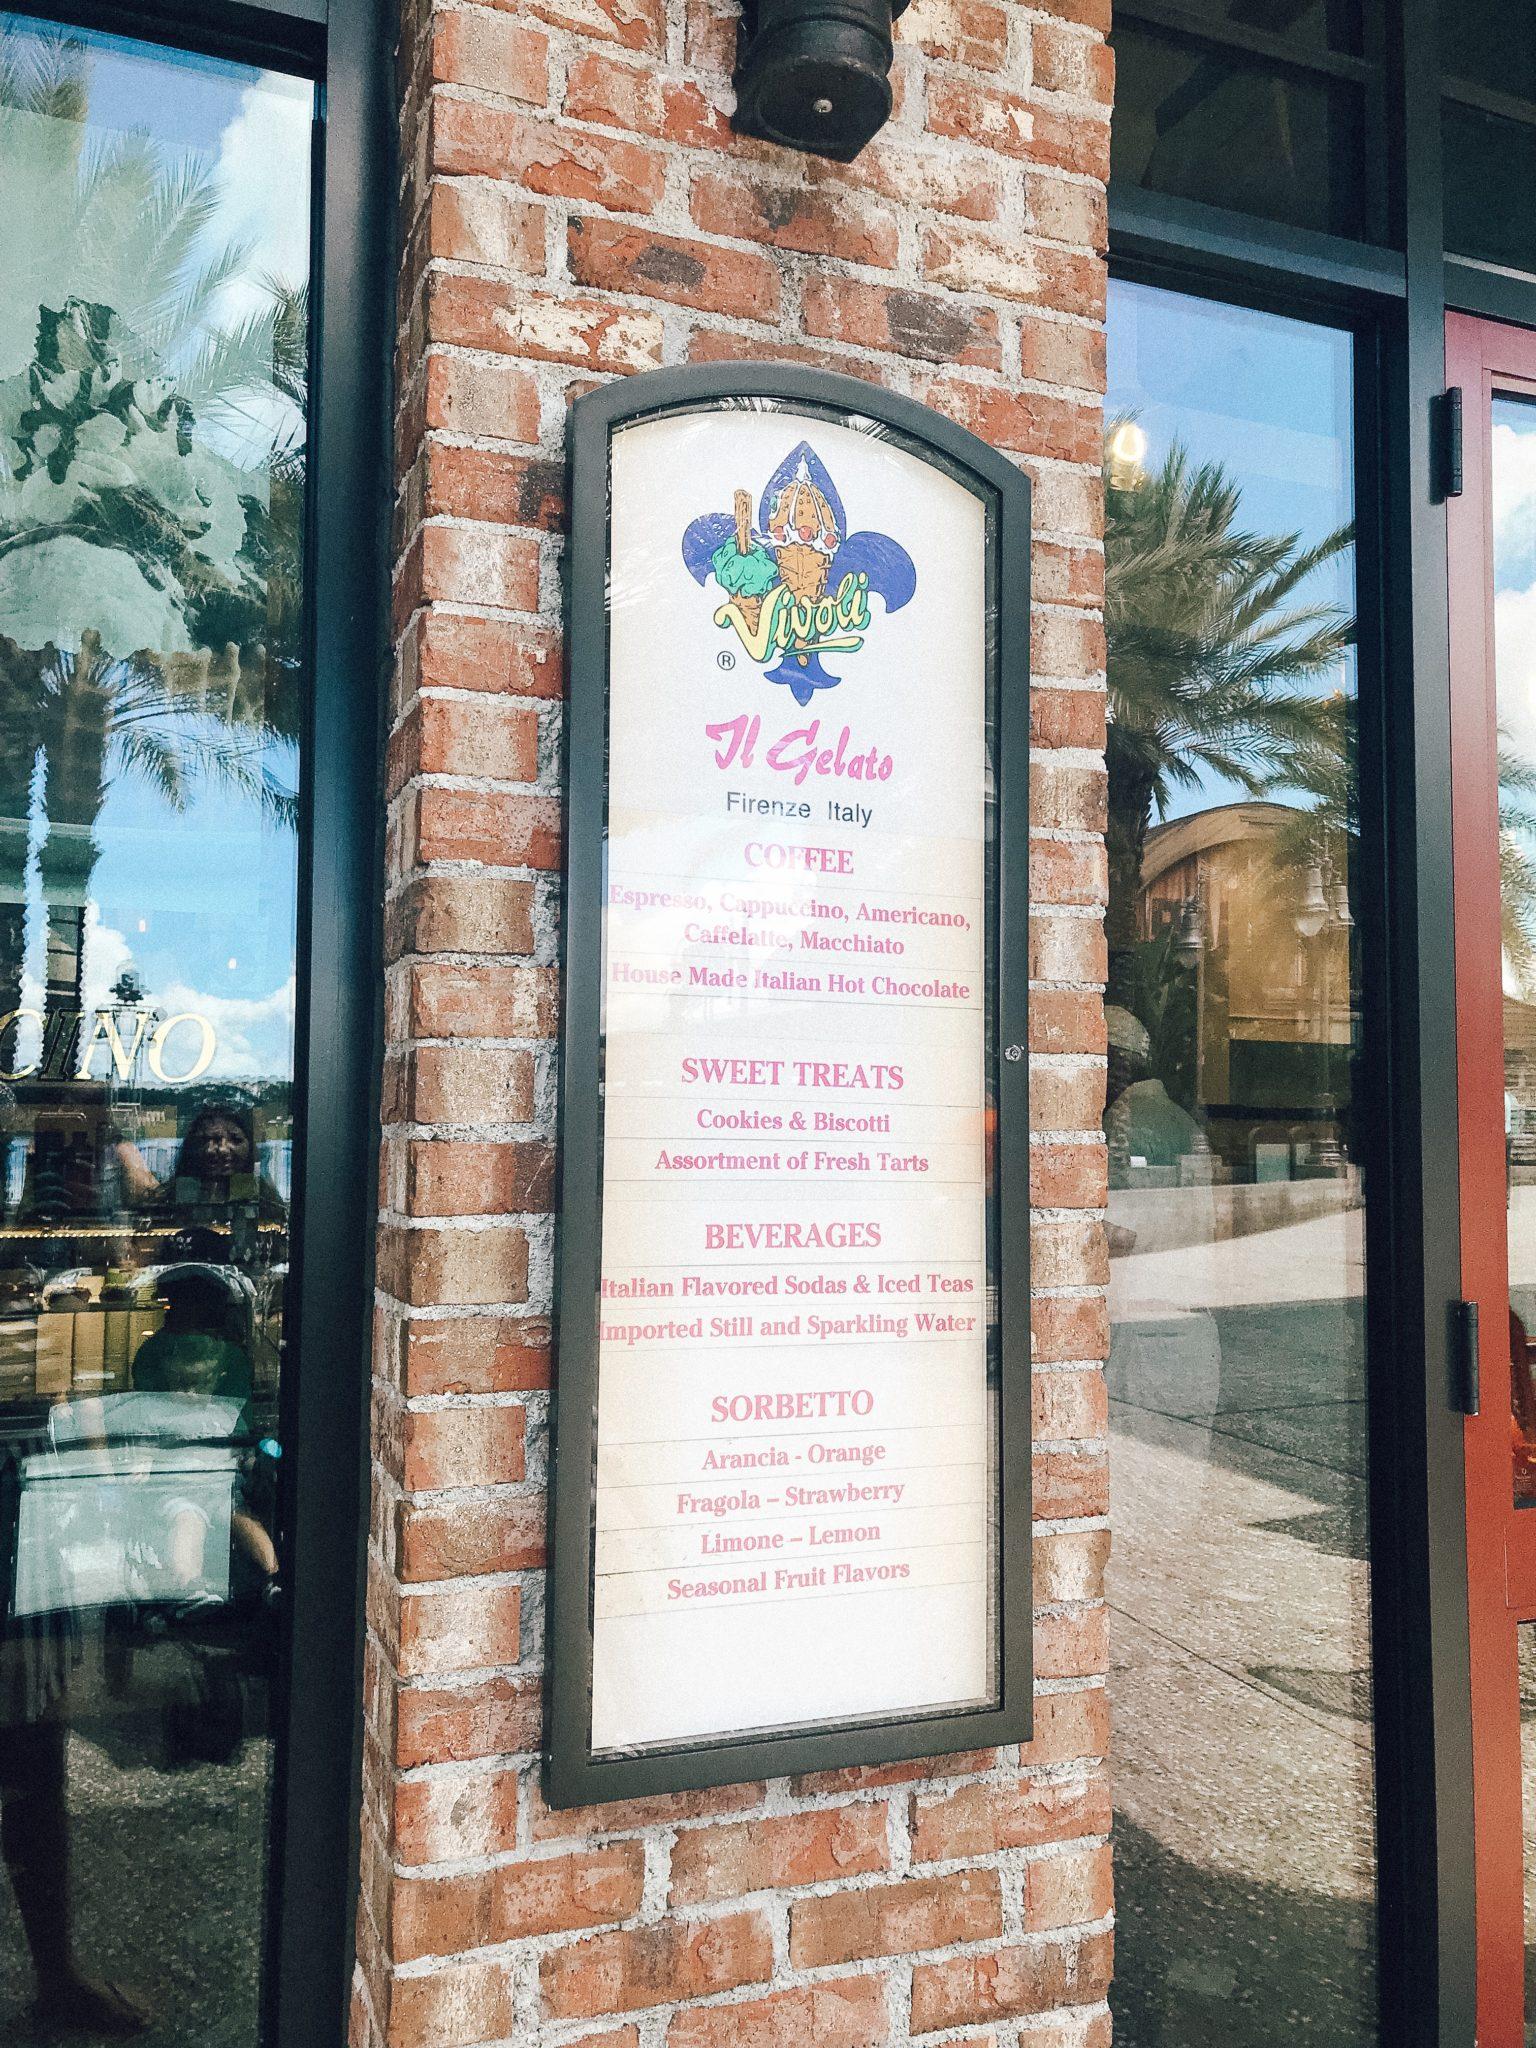 #DisneySprings Vivoli Il Gelato, Disney Springs restaurants and dining, disney world orlando for toddlers, Tampa parenting blog mothers blog motherhood blog Florida travel blogger travel influencer healthy mom blogger spring hill florida lifestyle parenting blog best mom blog 2018